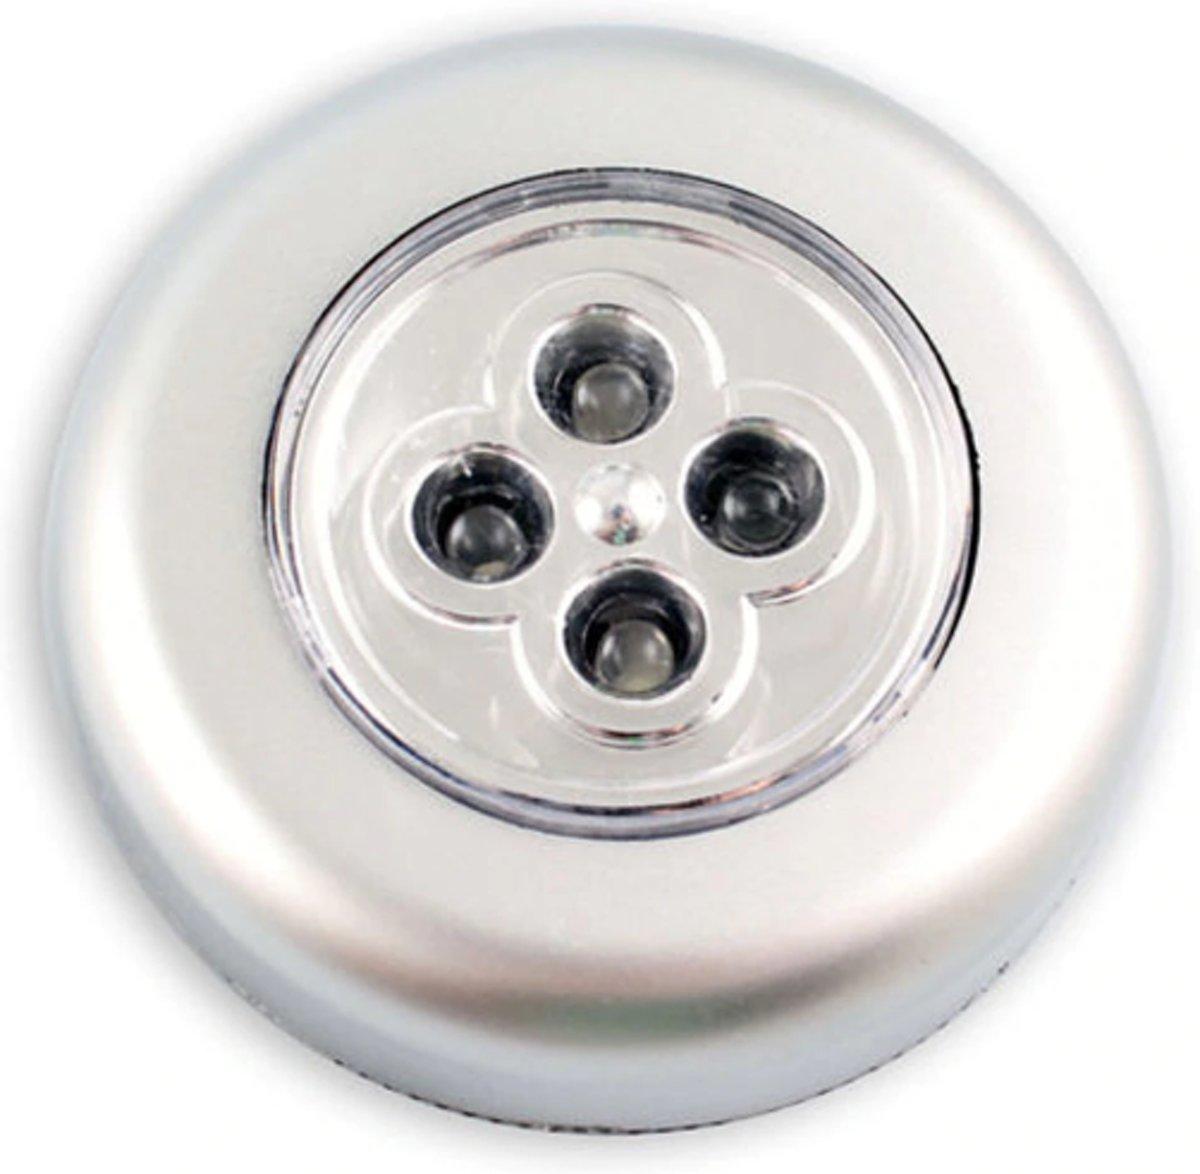 Stijlvolle zelfklevende druklamp met 4 LED's - Zilver - Felle mini spot - Push light - Draadloos kopen